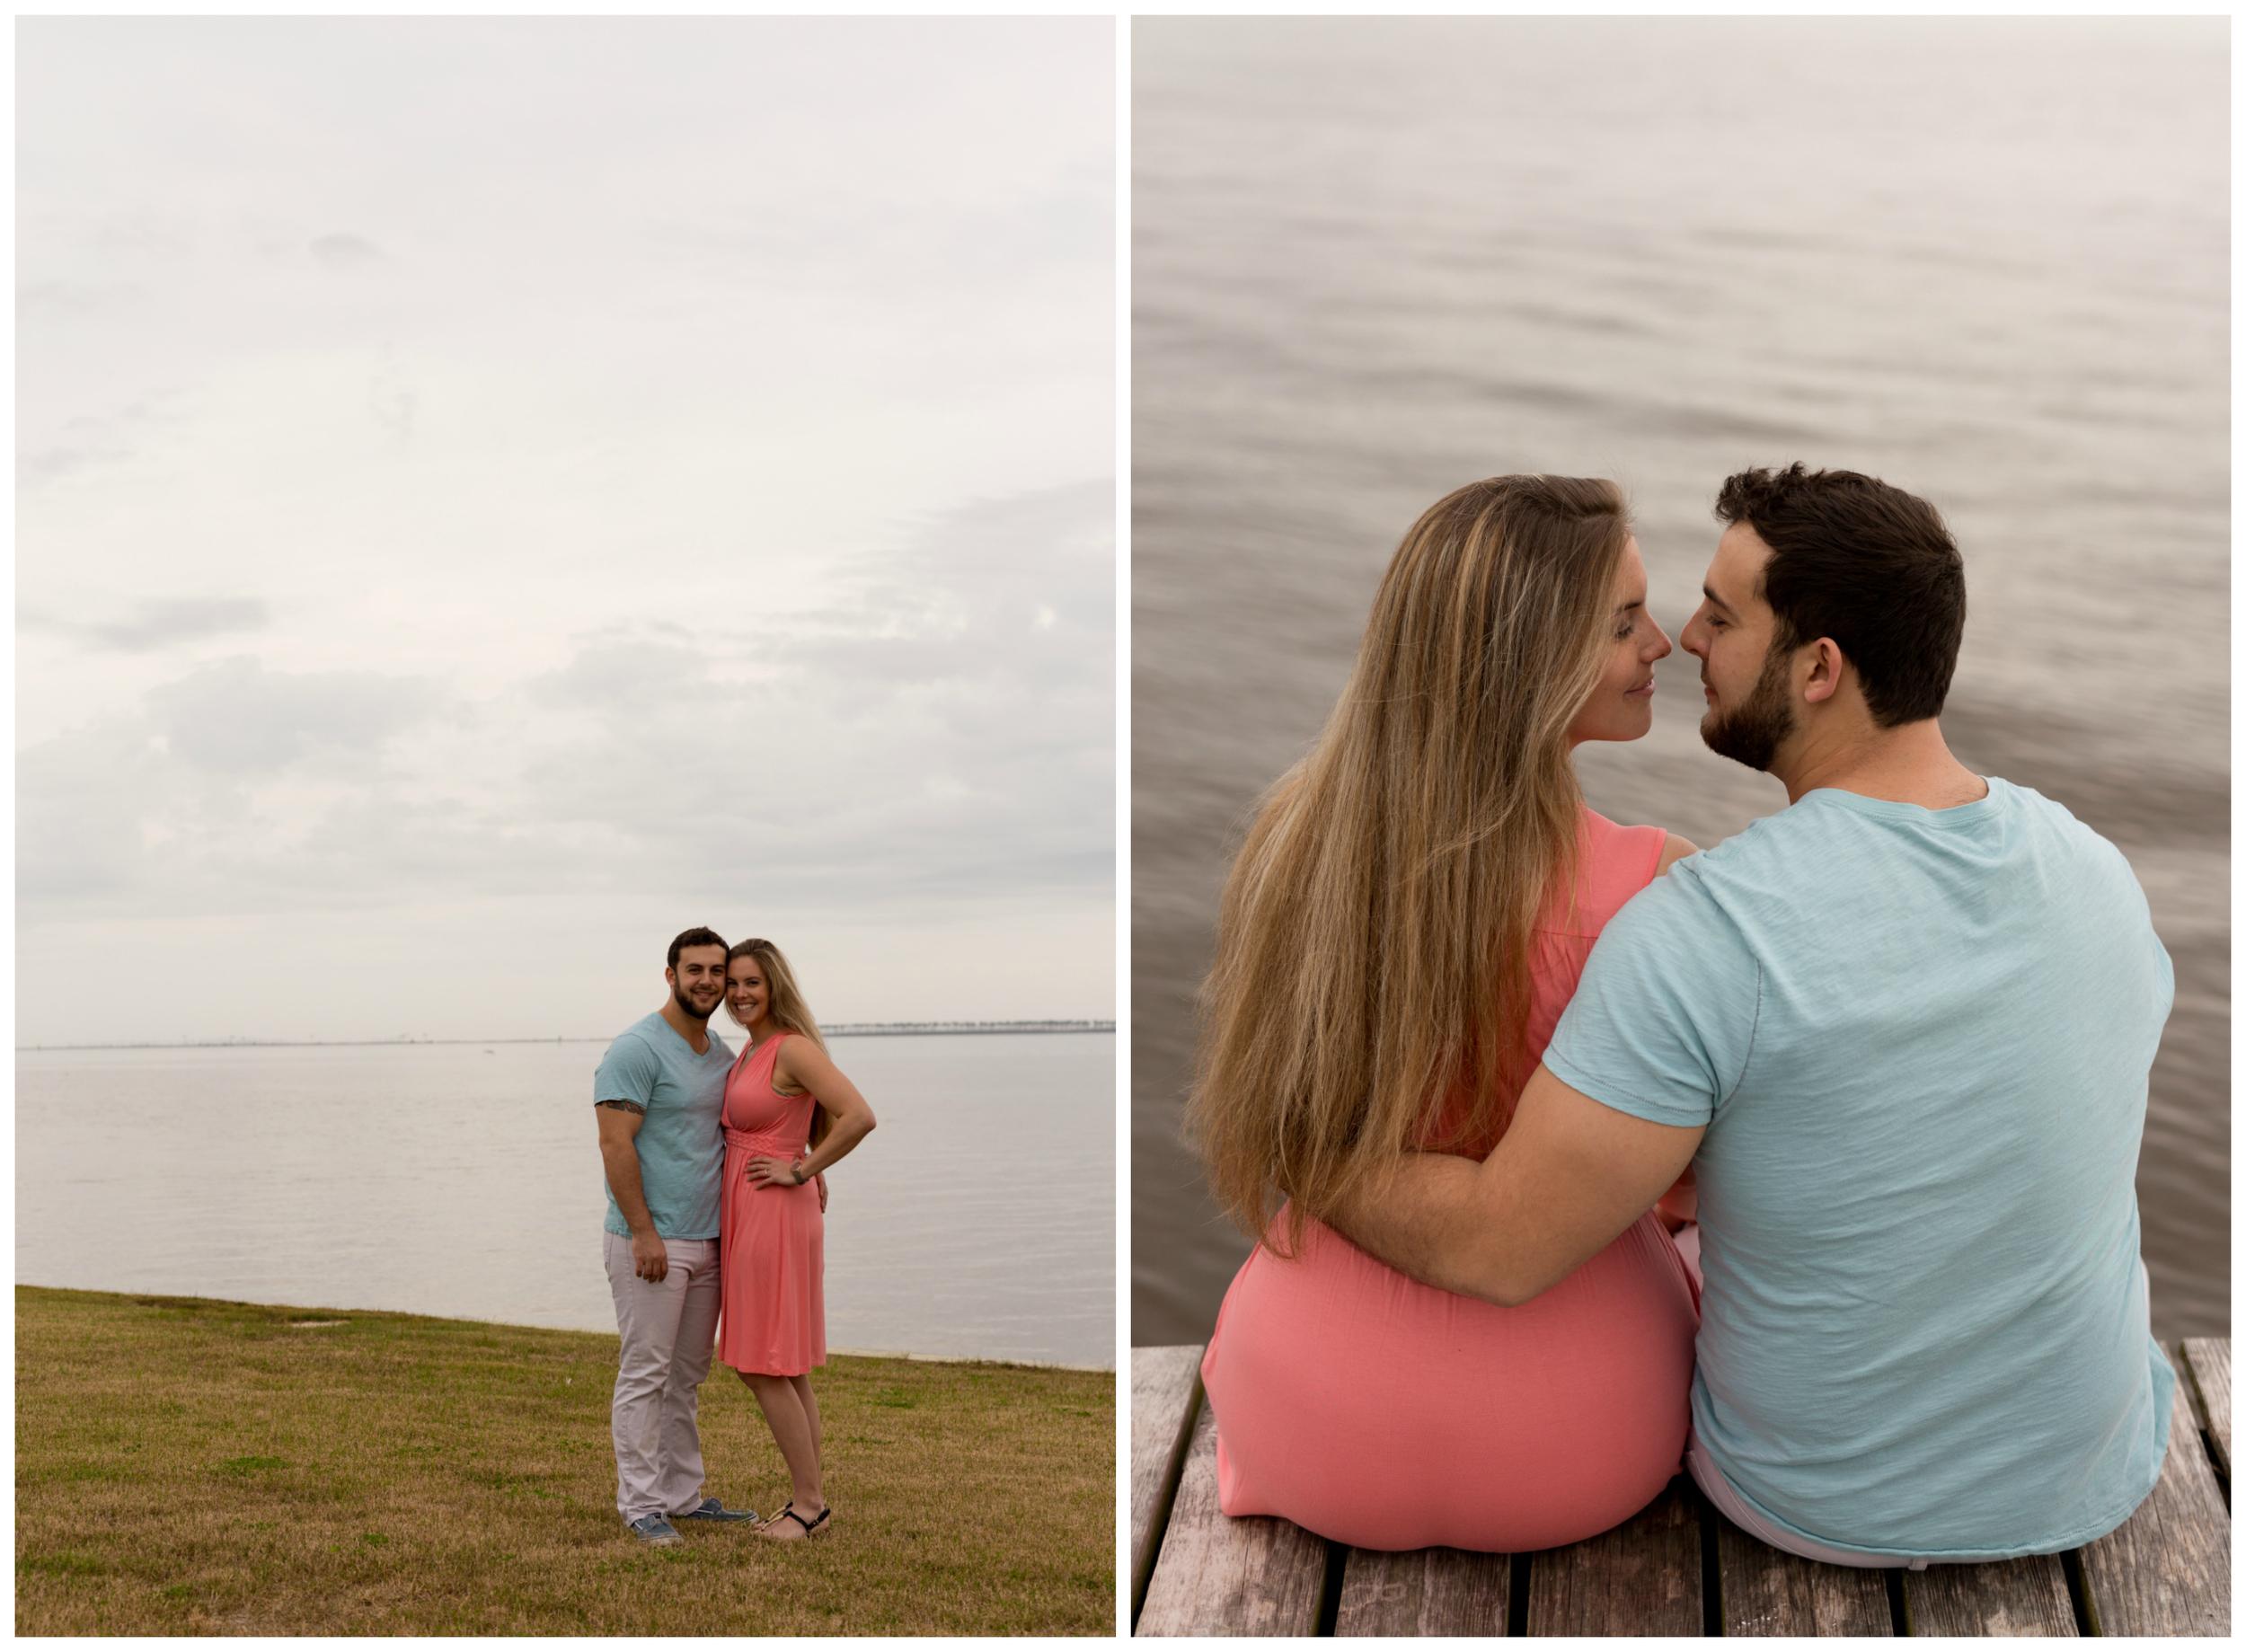 dreamy engagement photos at beach in Ocean Springs